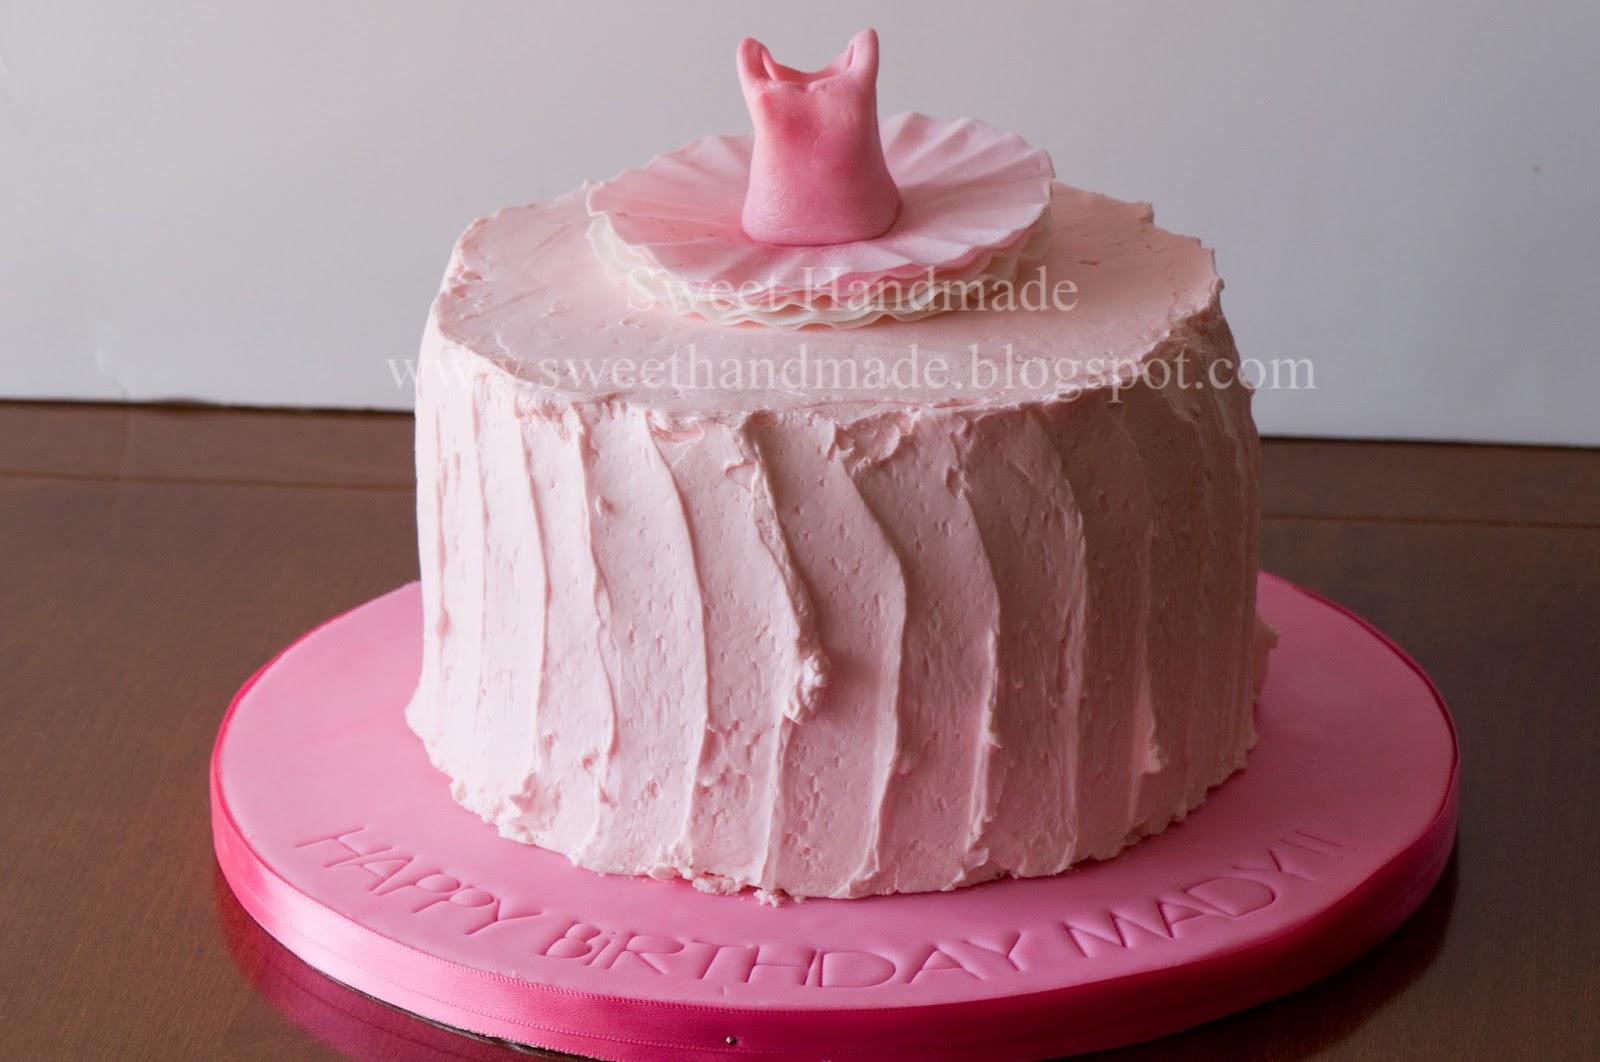 15th Birthday Cake Cake Ideas and Designs